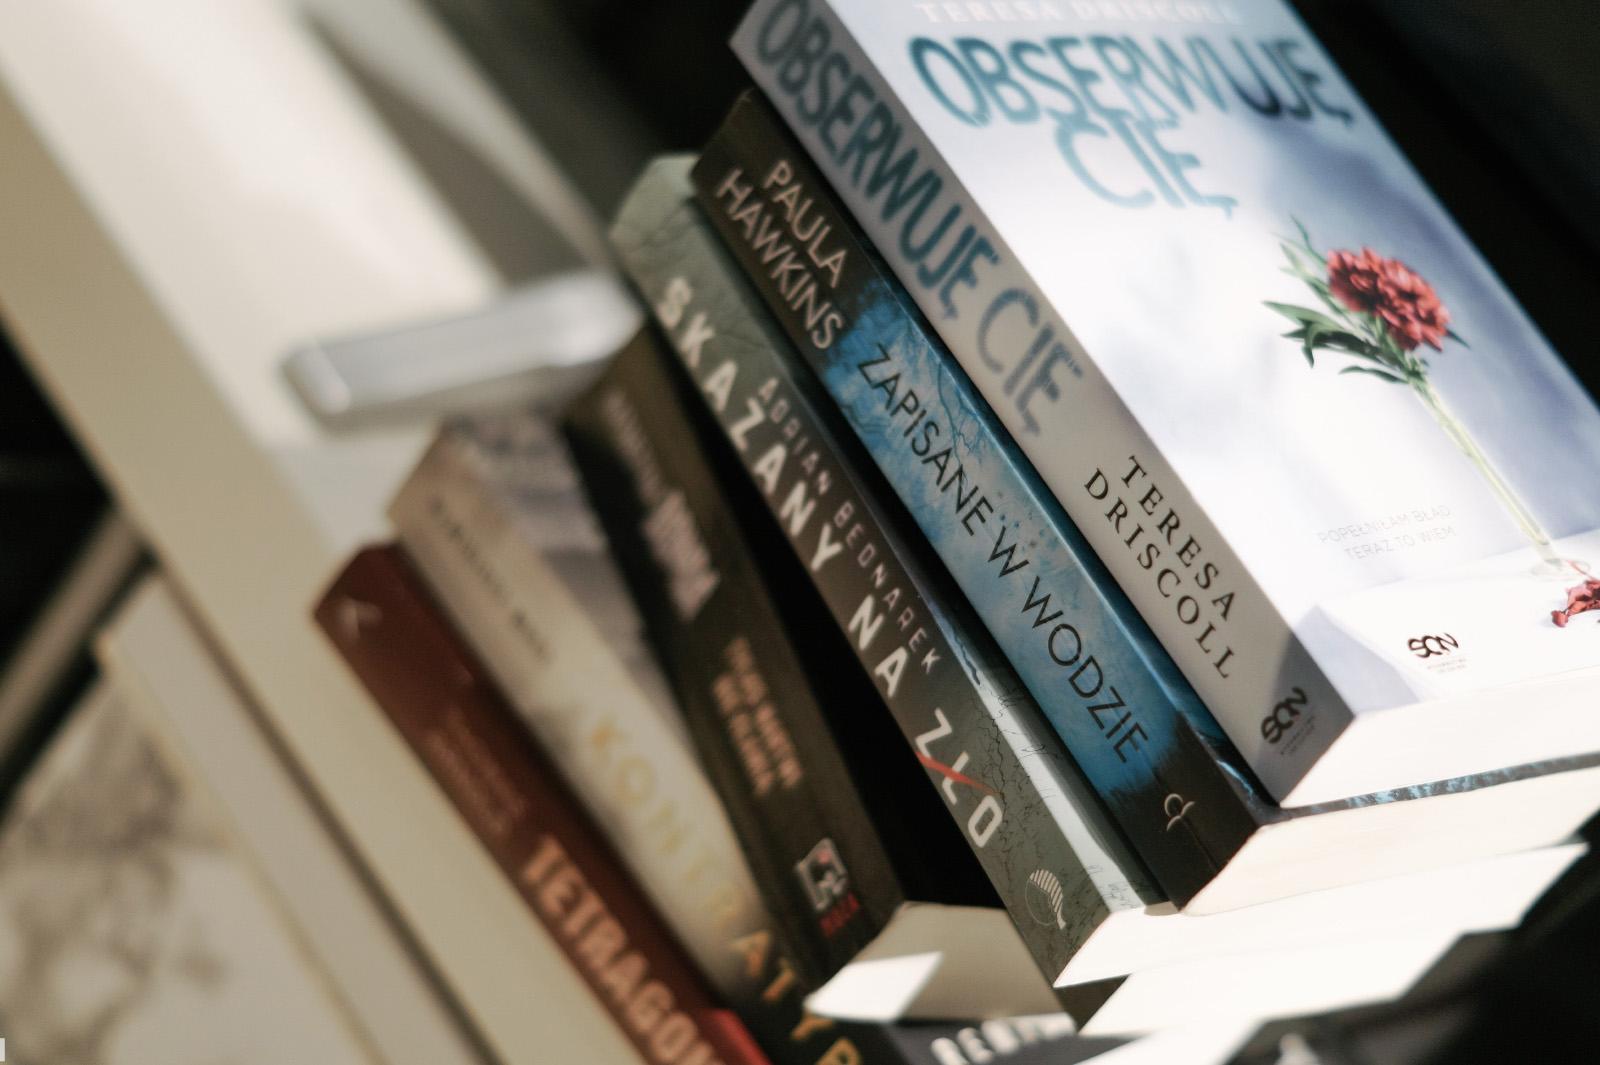 książka na prezent, prezent książka, prezent książkowy, jaka książka na prezent, prezenty książki